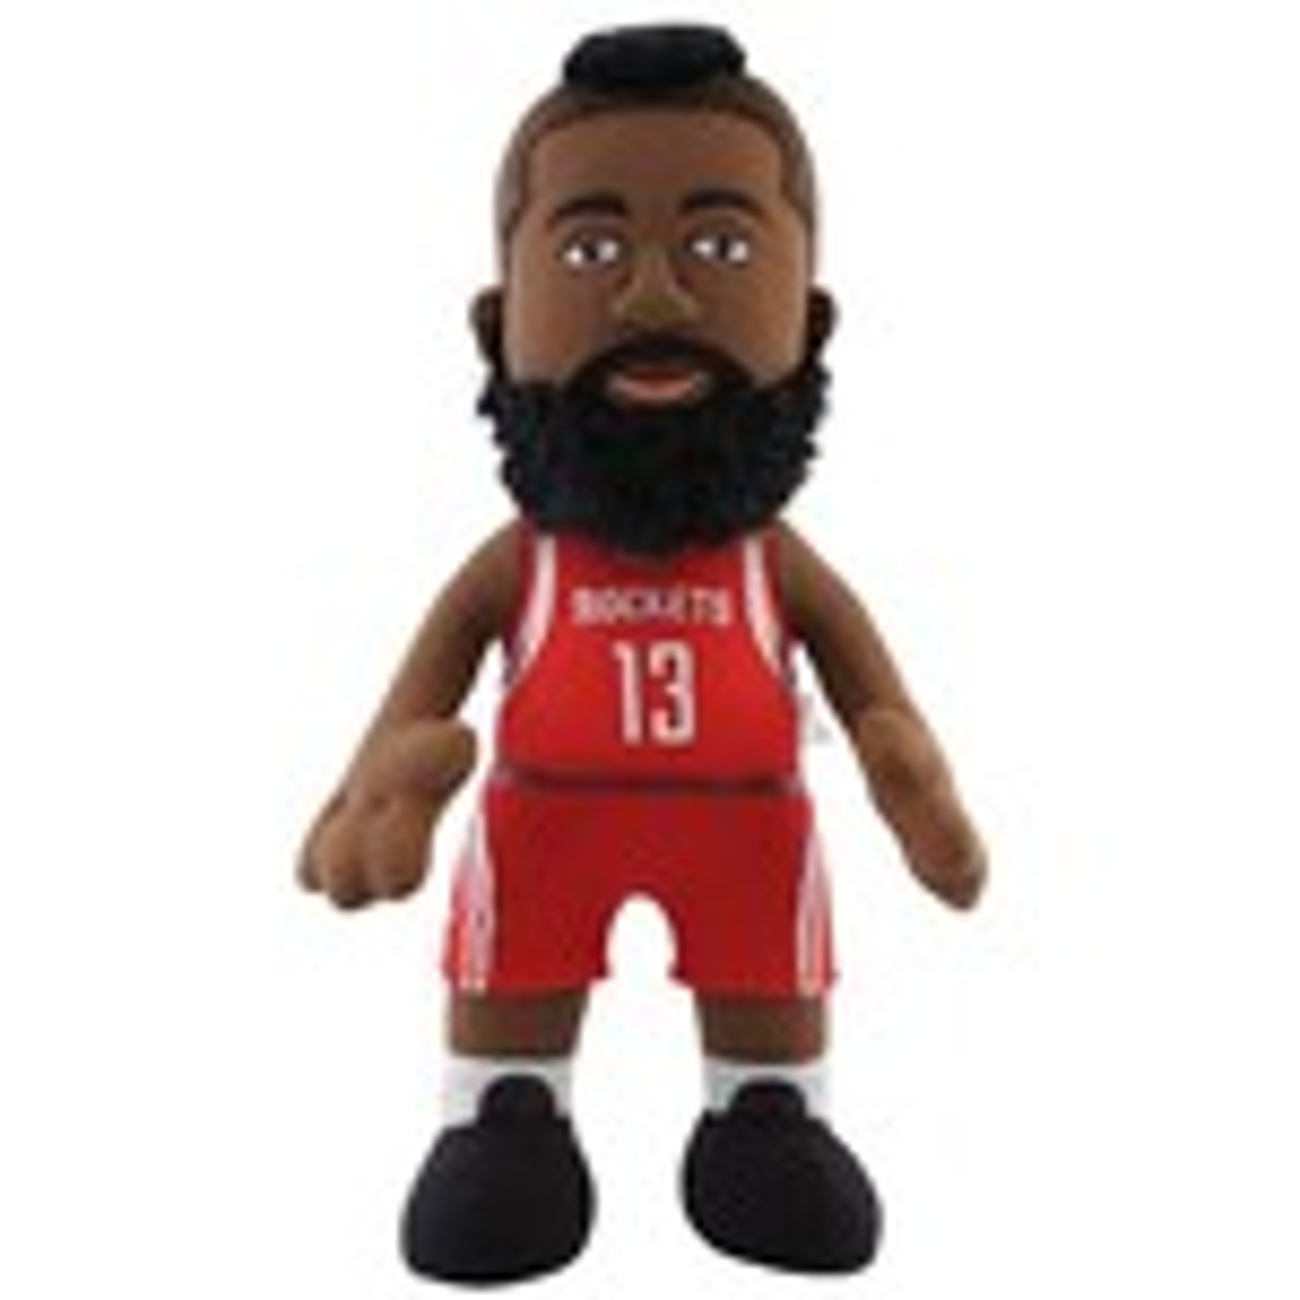 "Bleacher Creatures™ Houston Rockets James Harden 10"" Plush Figure"